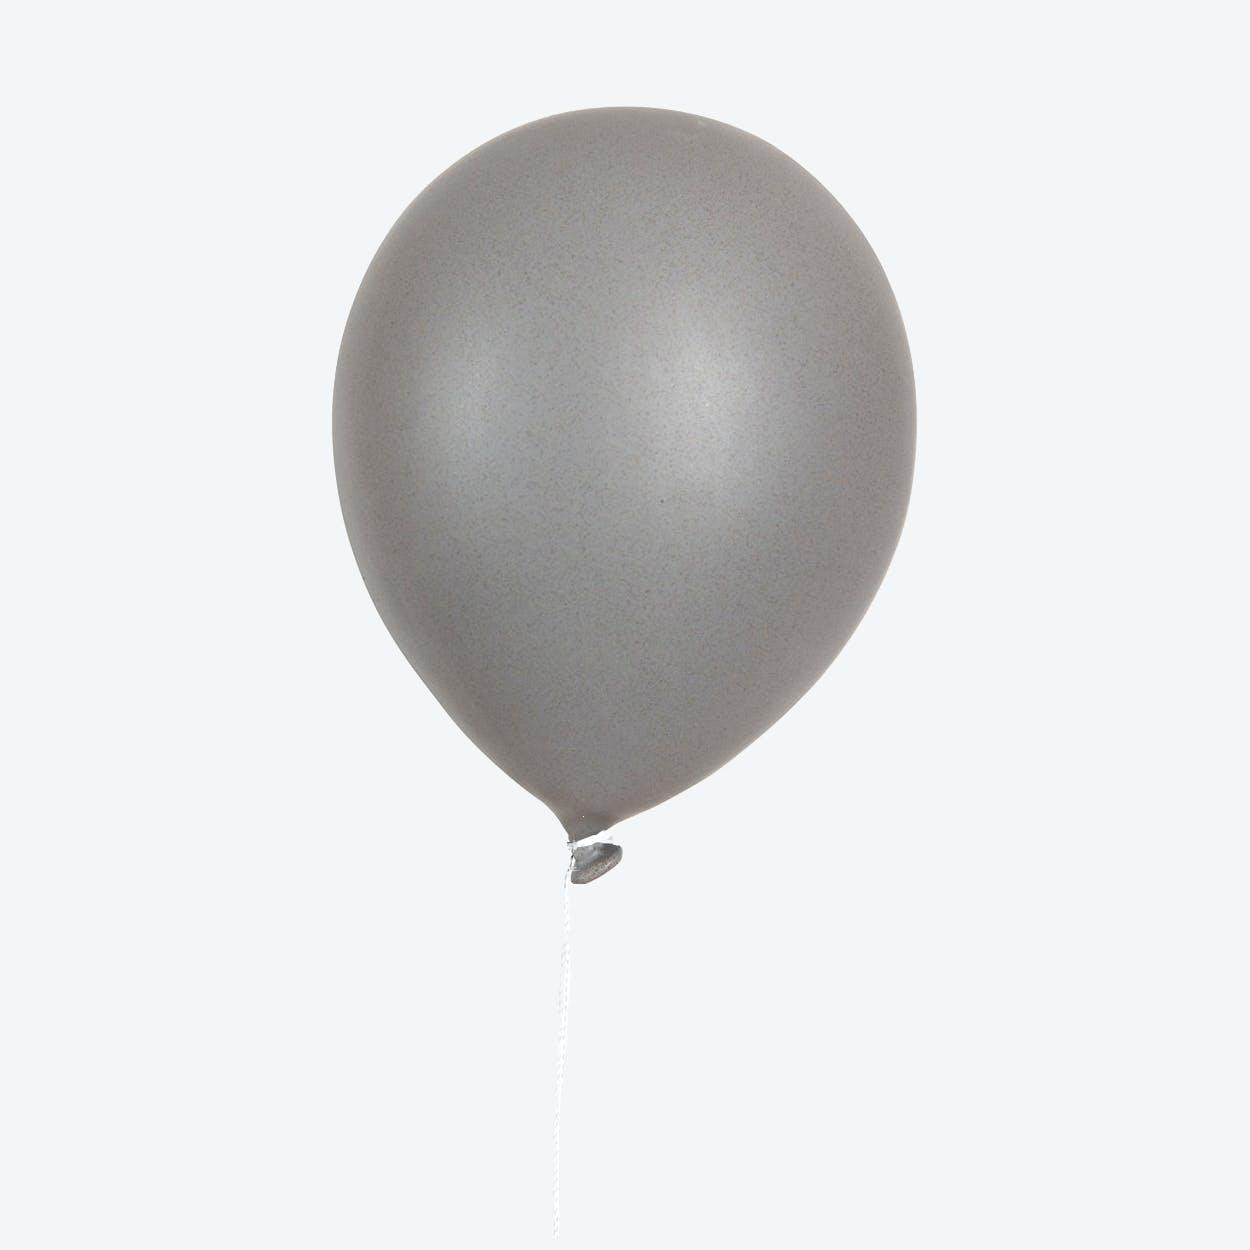 Ceramic Balloon Wall Decor in Grey